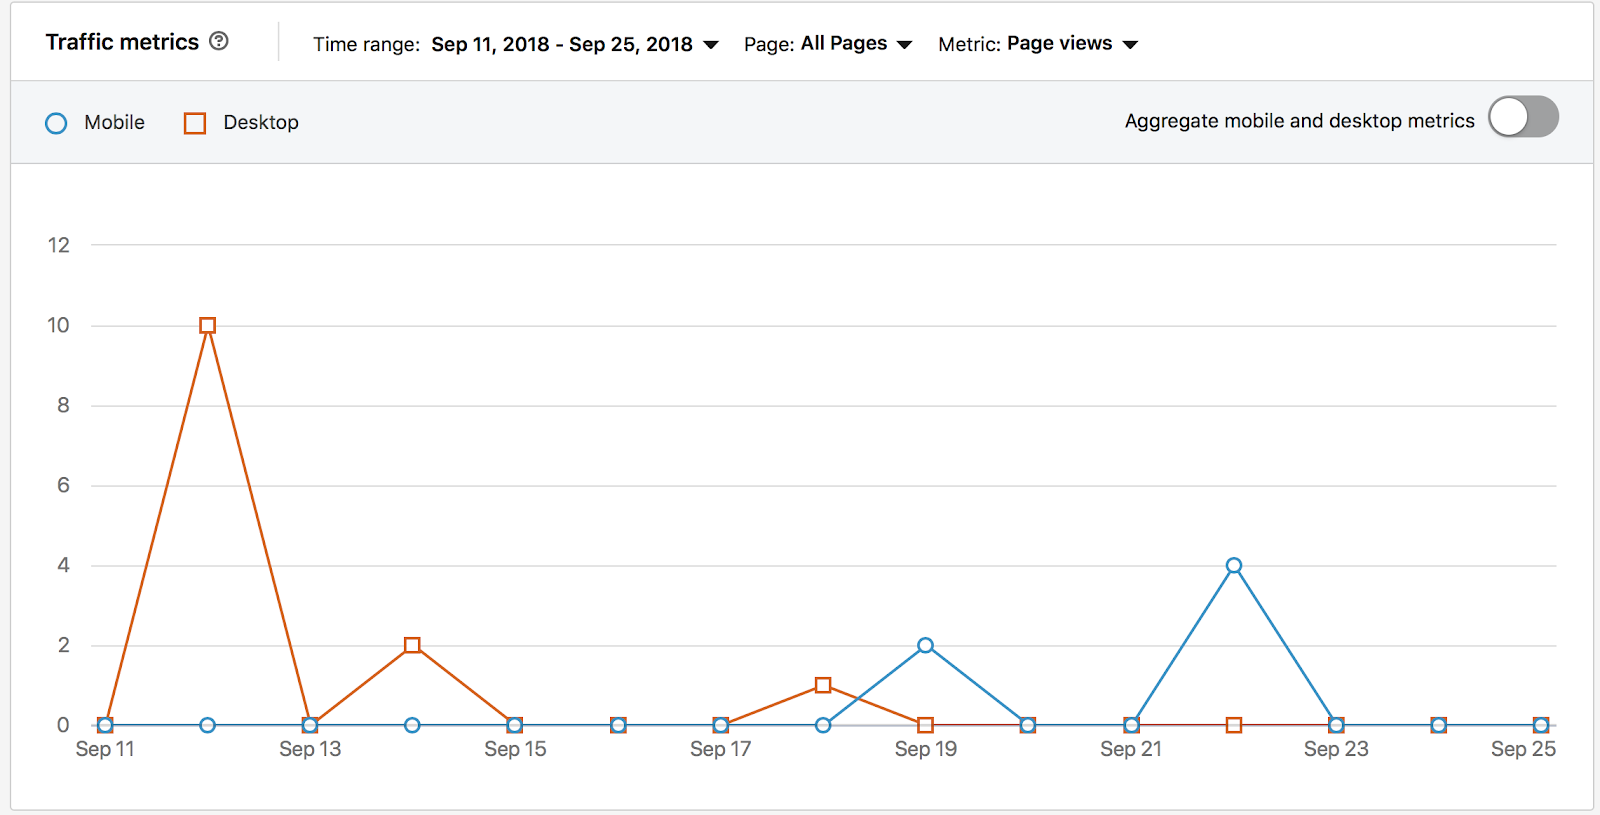 LinkedIn Traffic Metrics